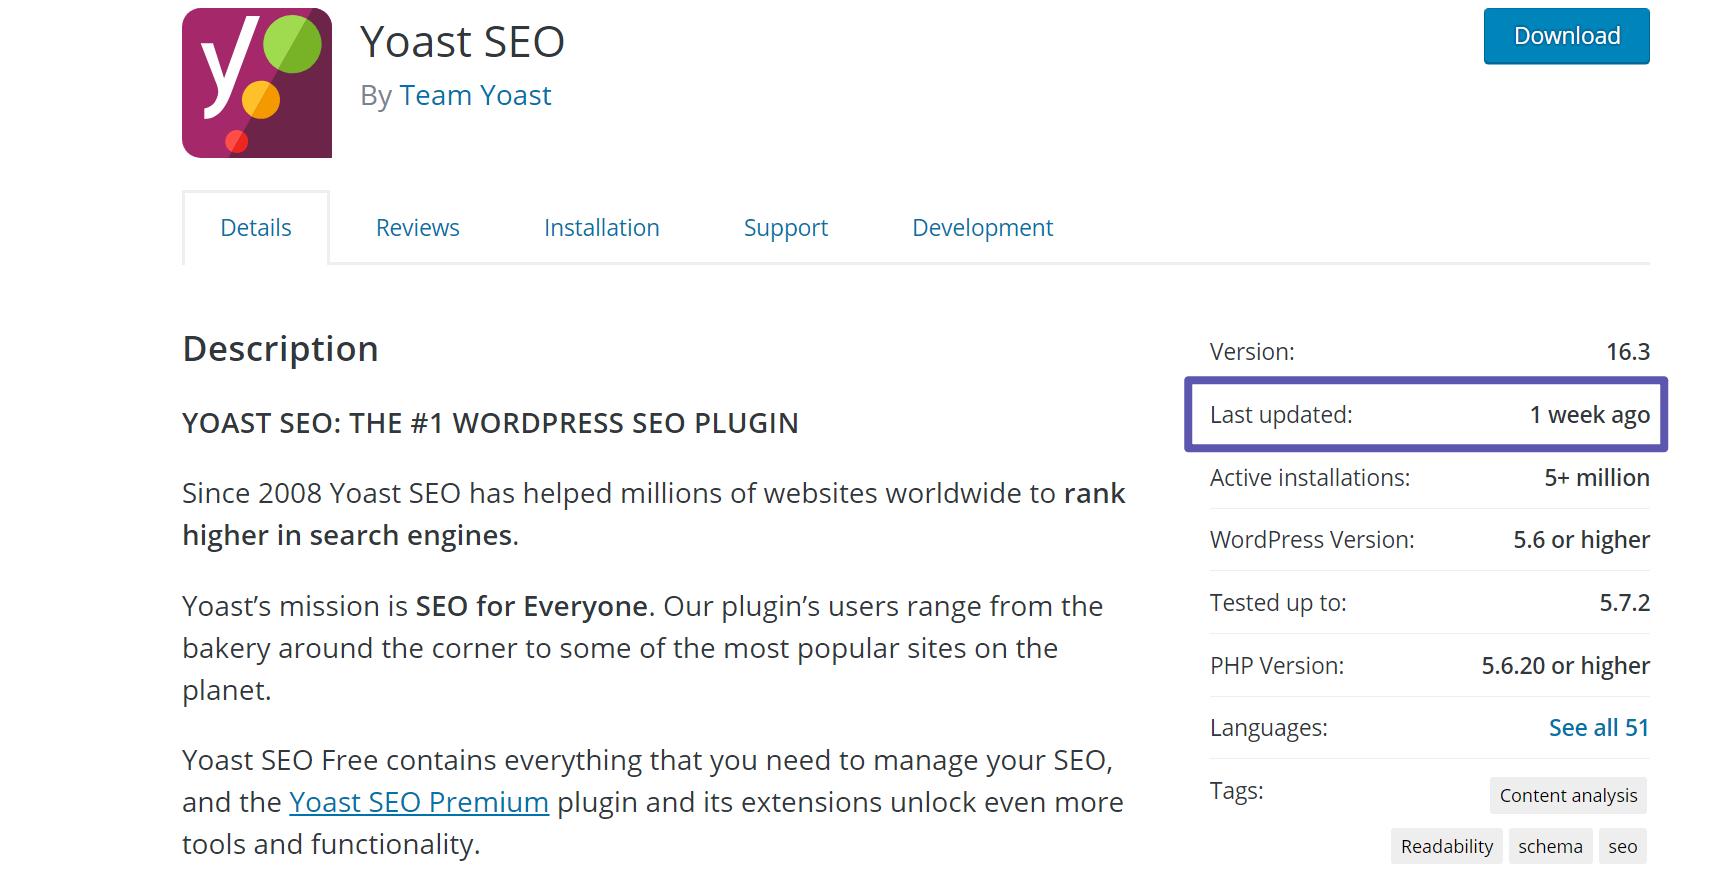 Update details for a WordPress plugin